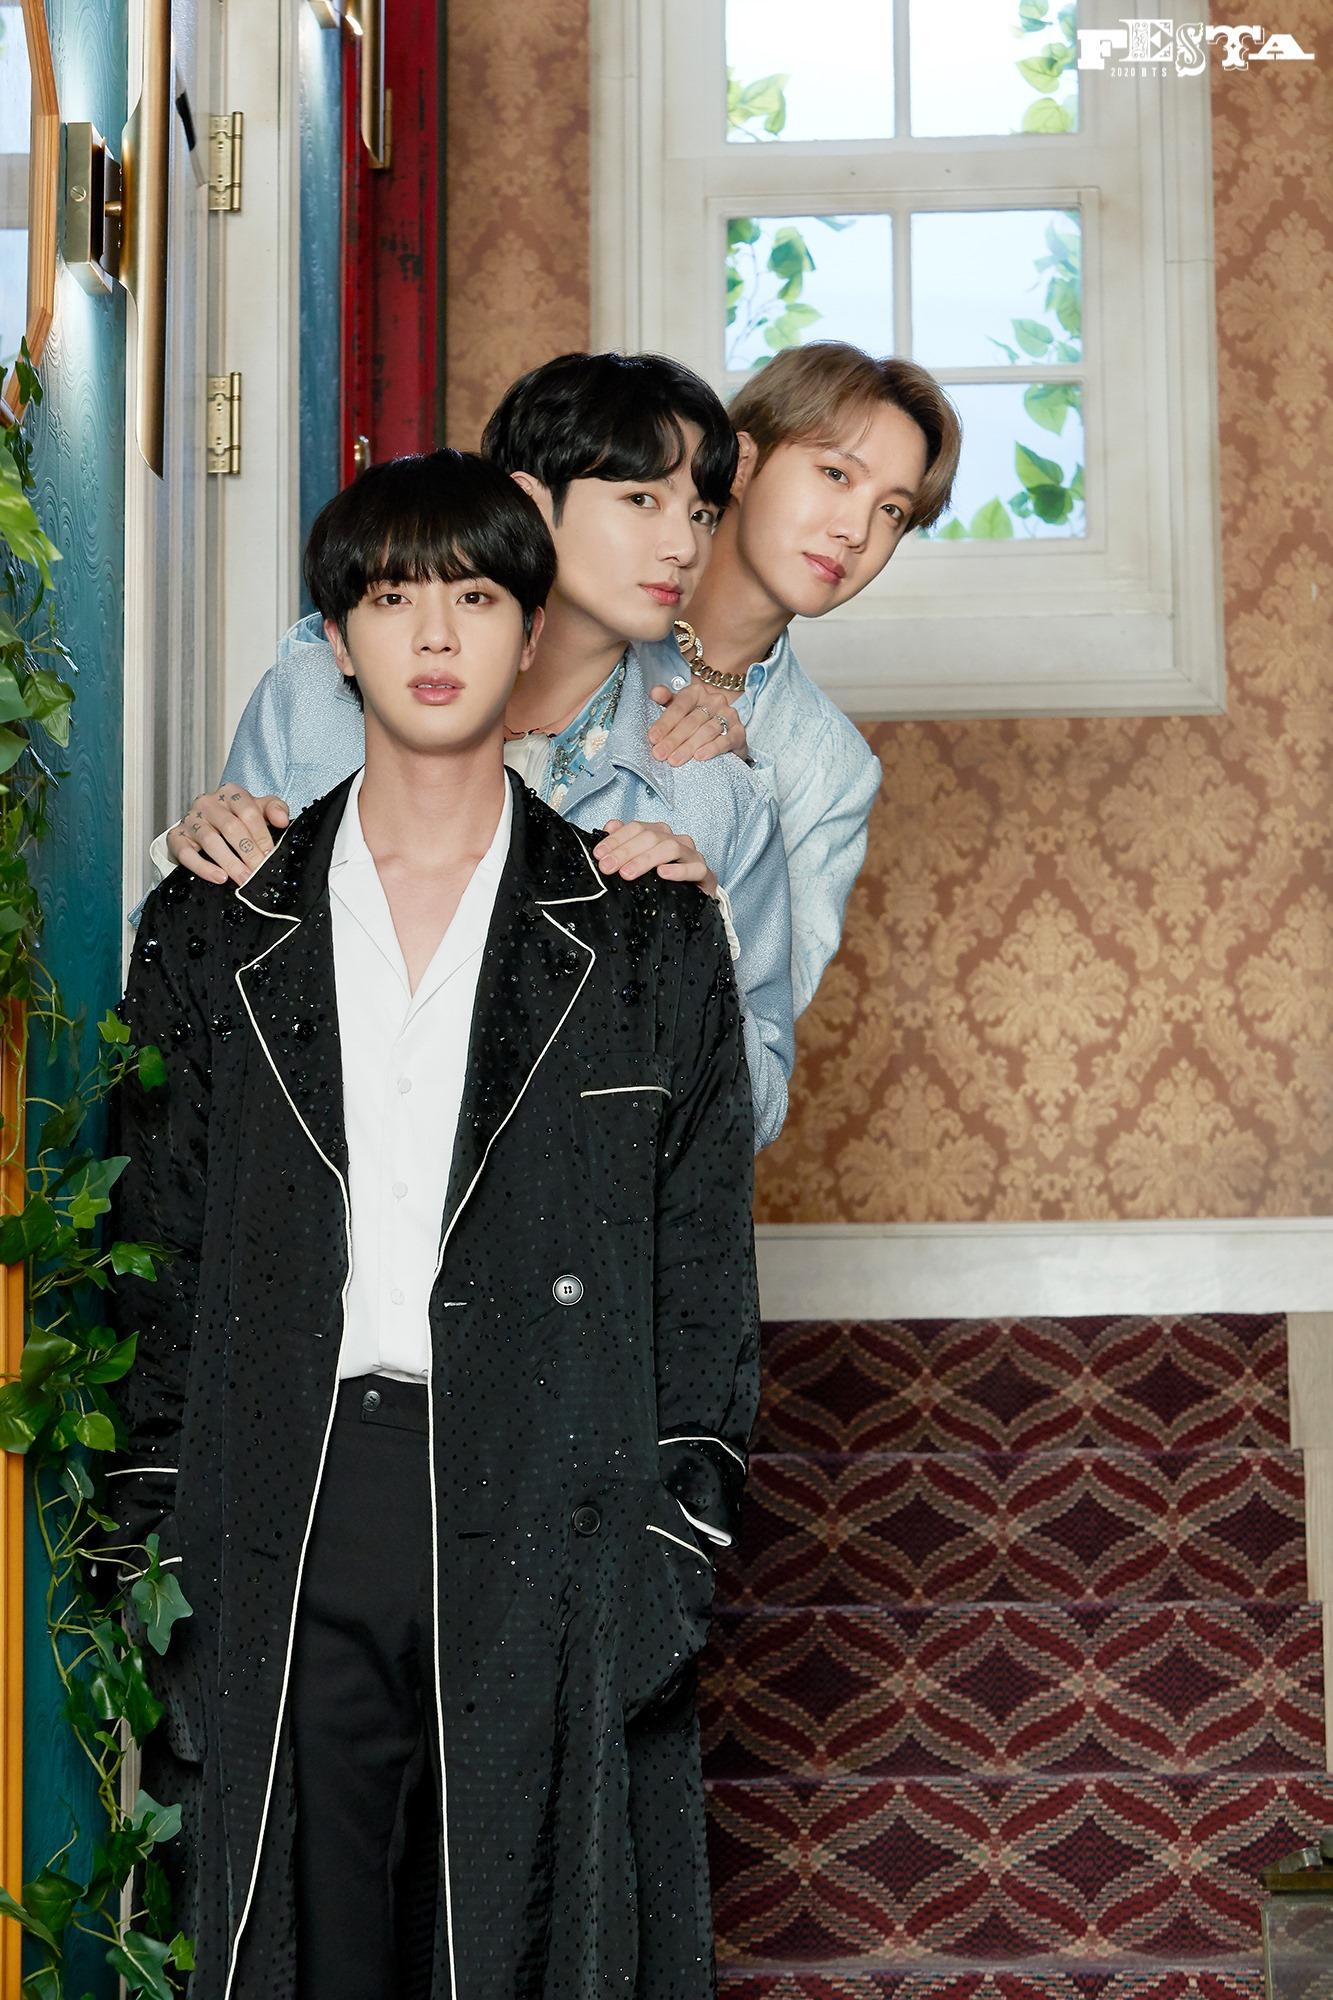 Foto: Courtesy of Big Hit Entertainment